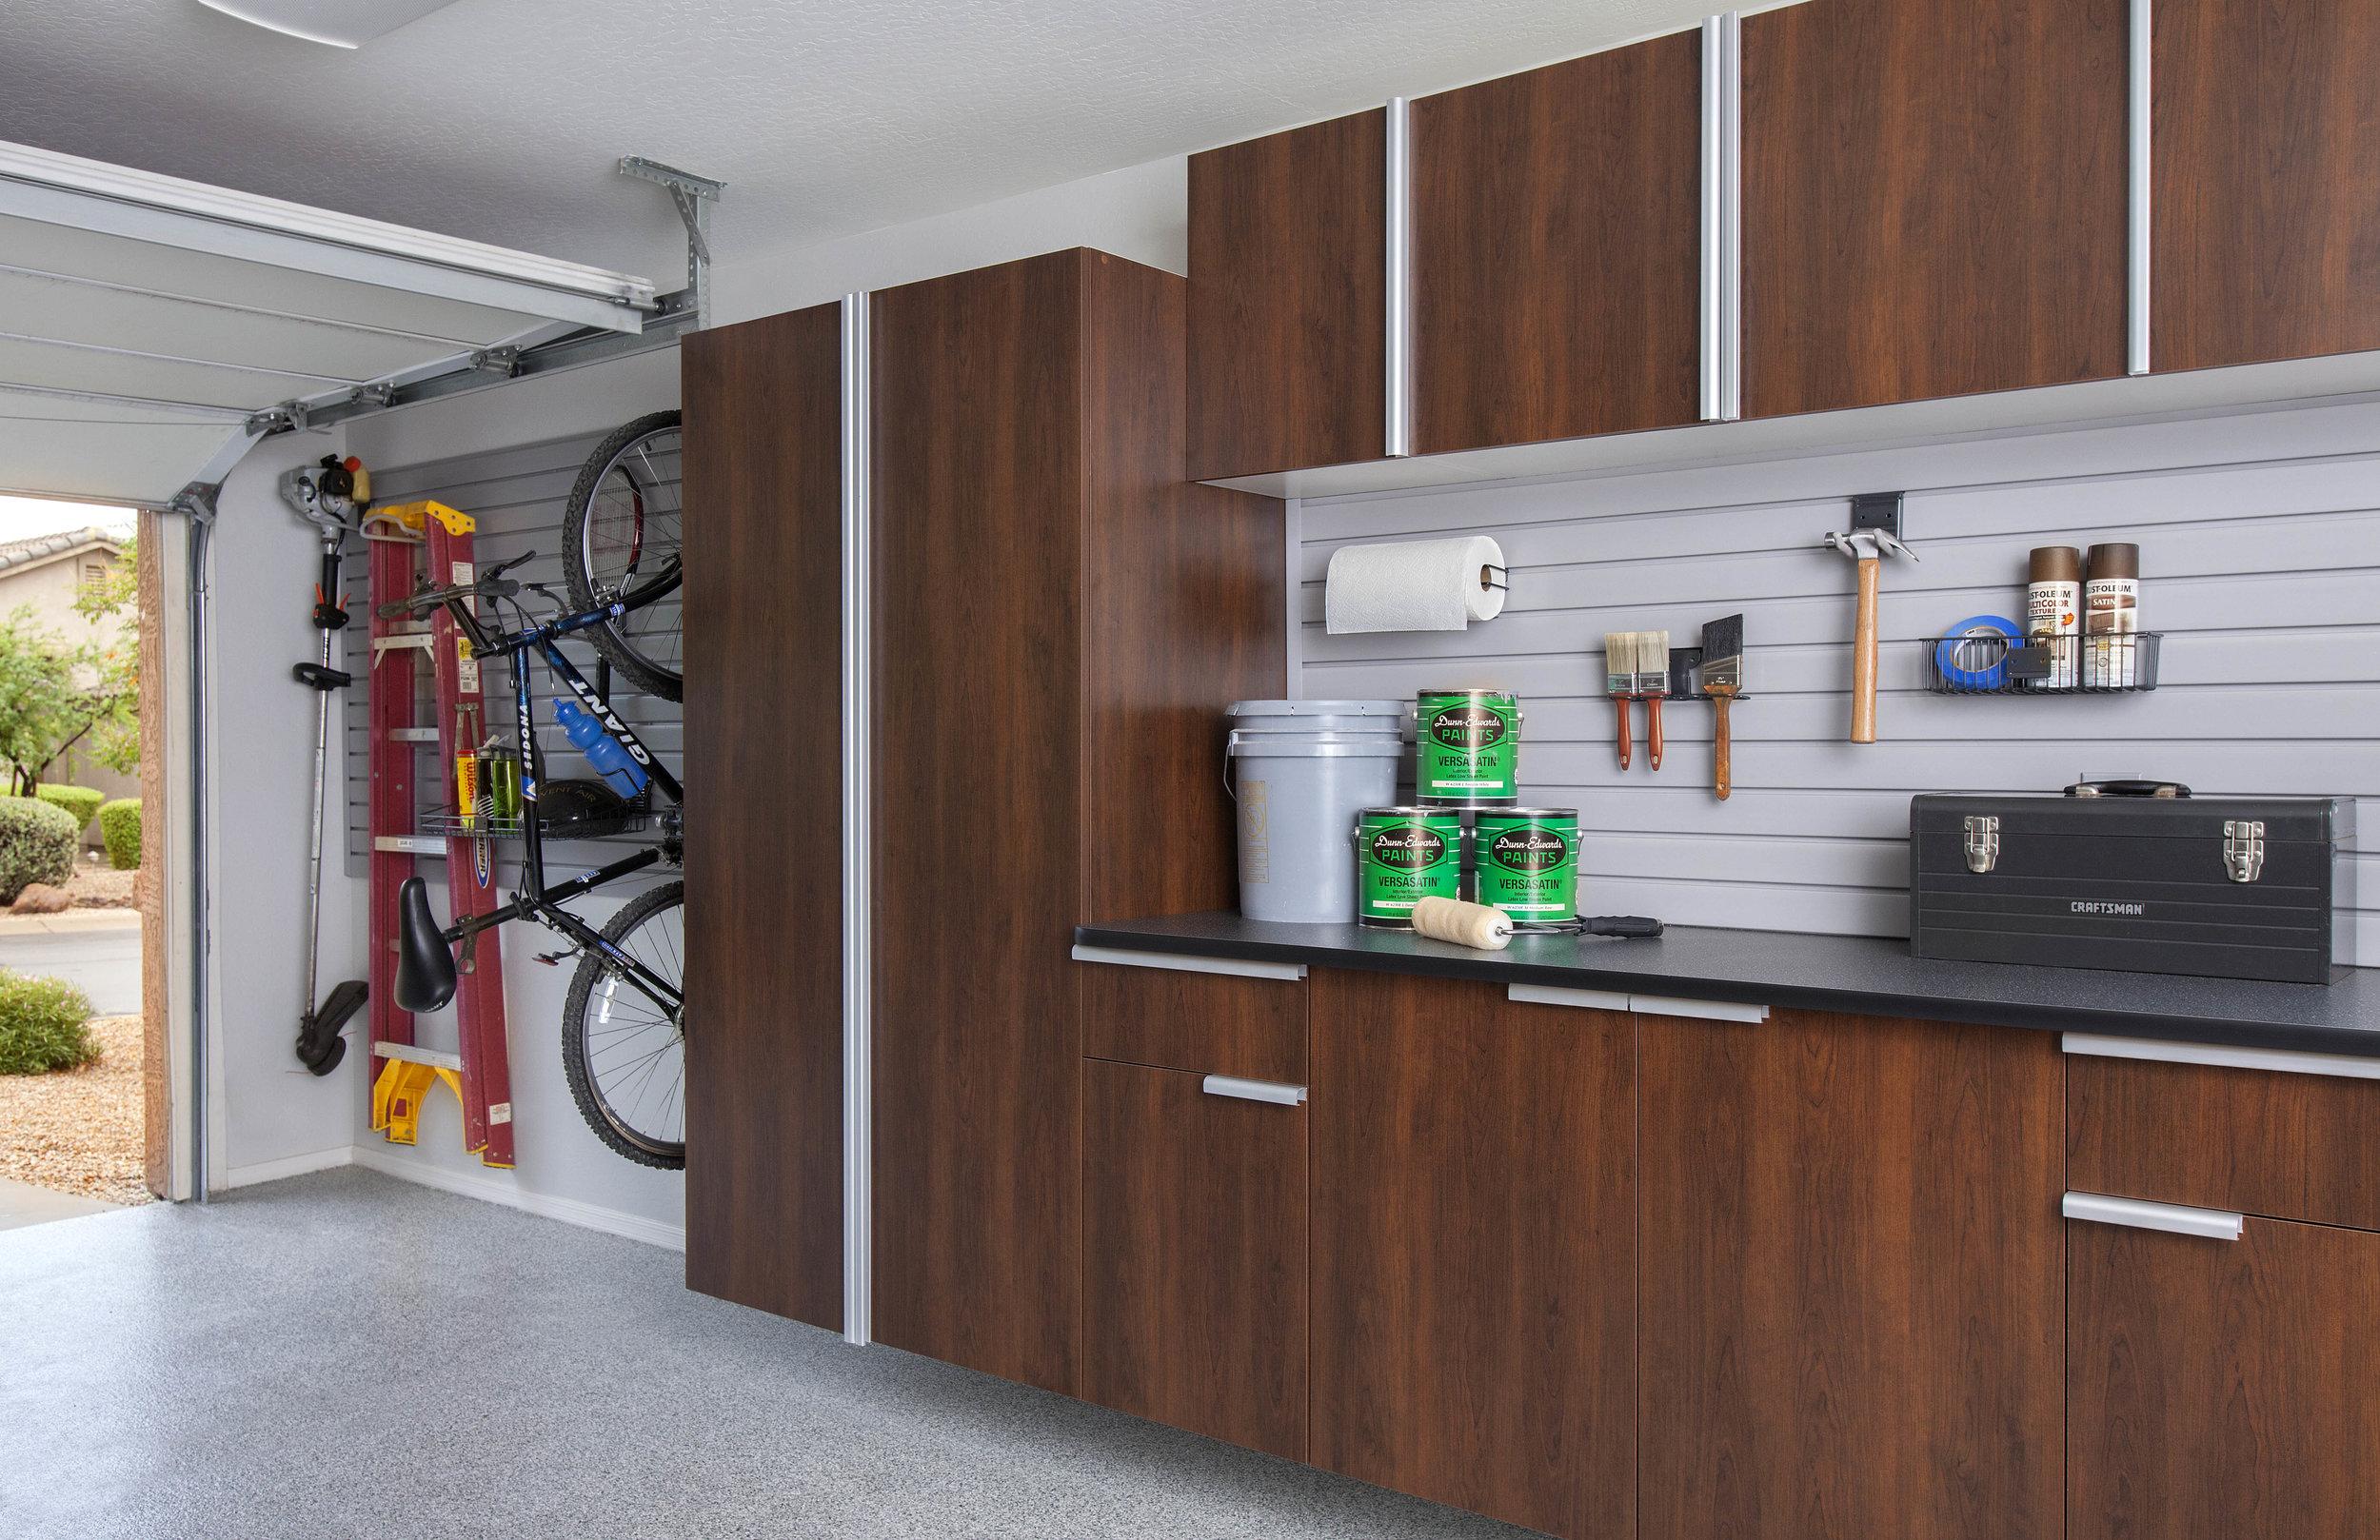 Coco Cabinets-Extruded Handles-Ebony Counter-Slatwall-Smoke Floor-ANGLE-Fetch-Sep 2013.jpg